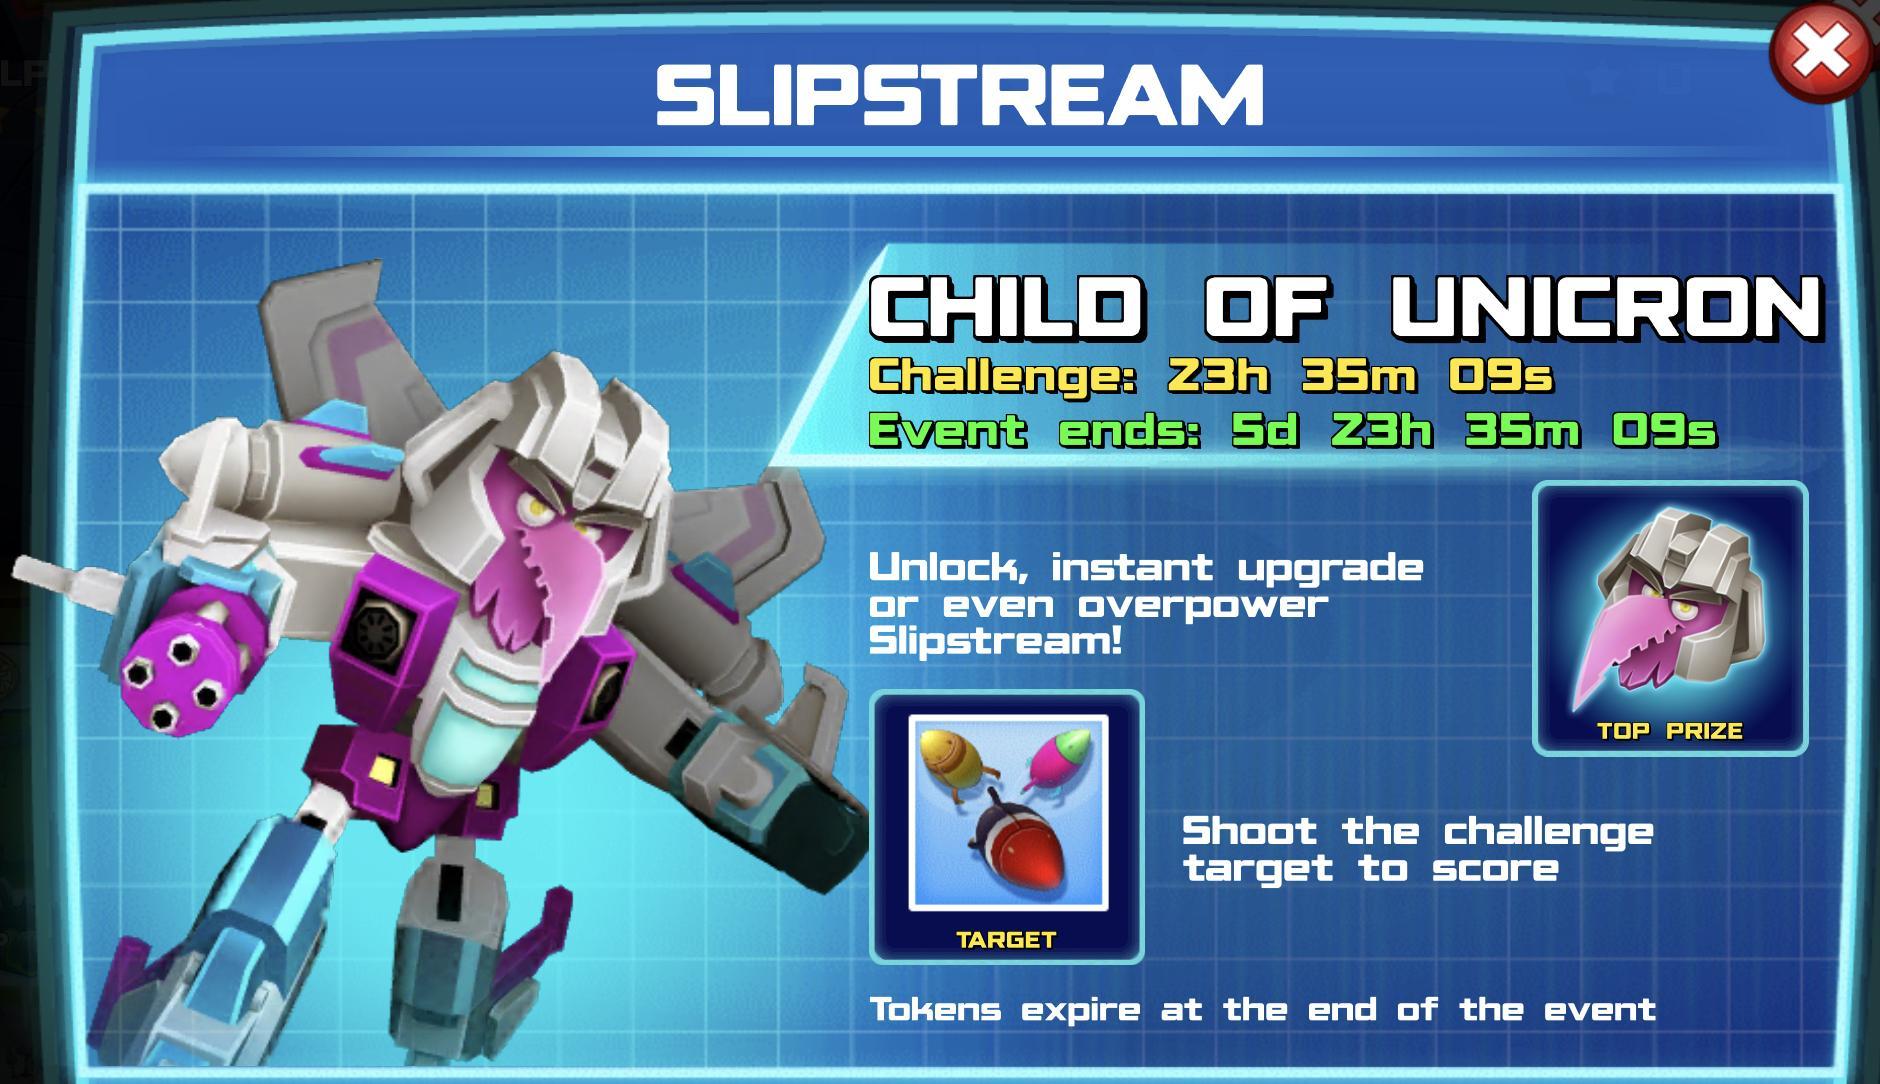 The event banner for Slipstream